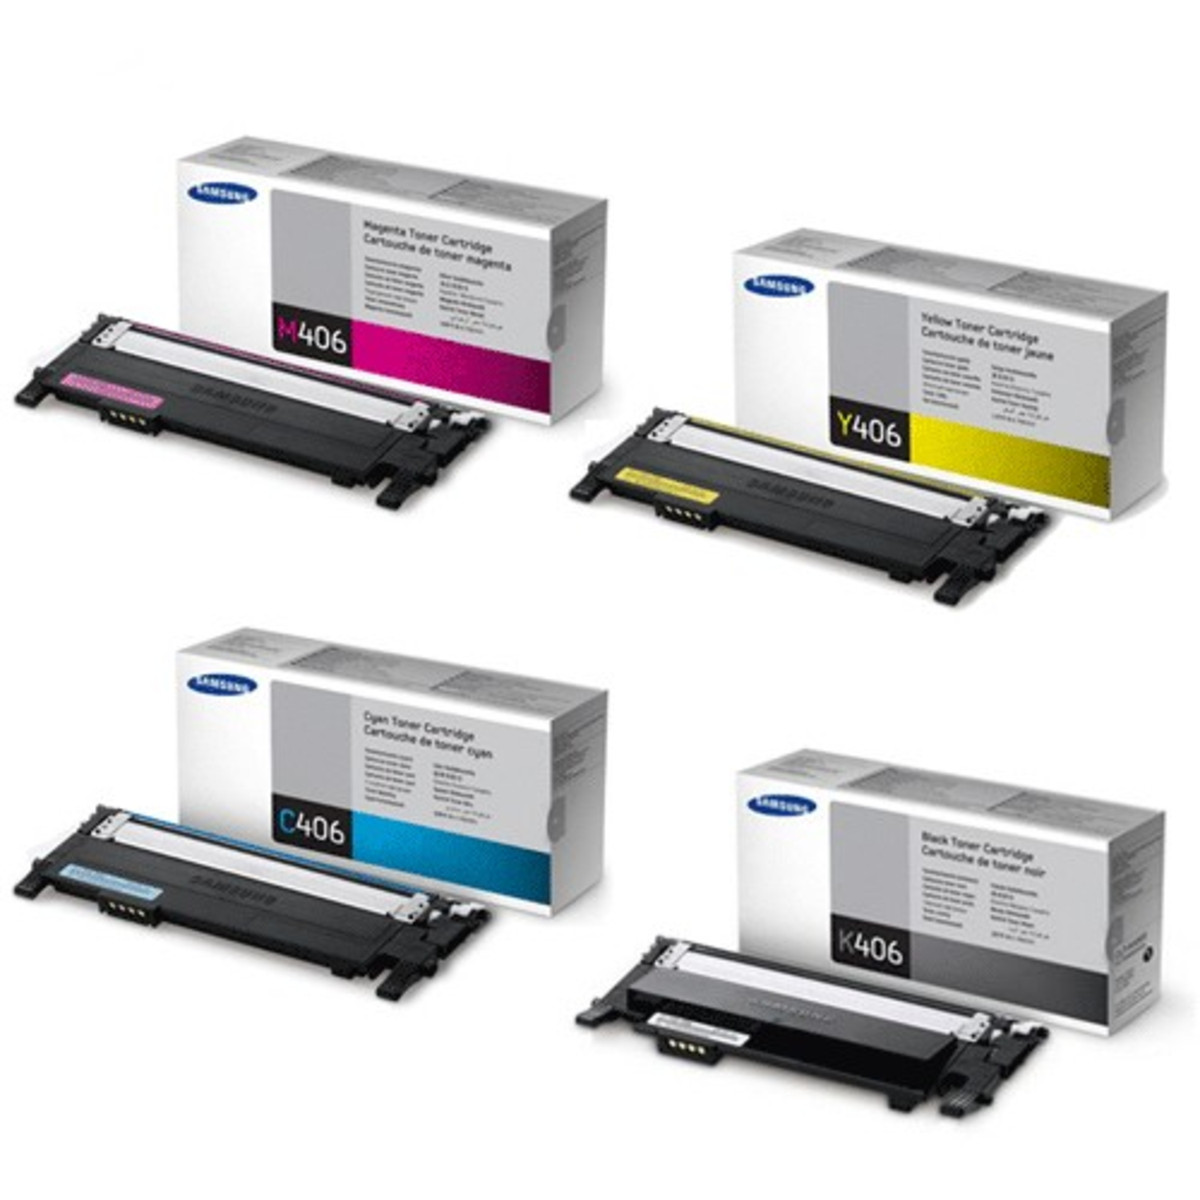 Samsung CLT-406 Bundle Pack